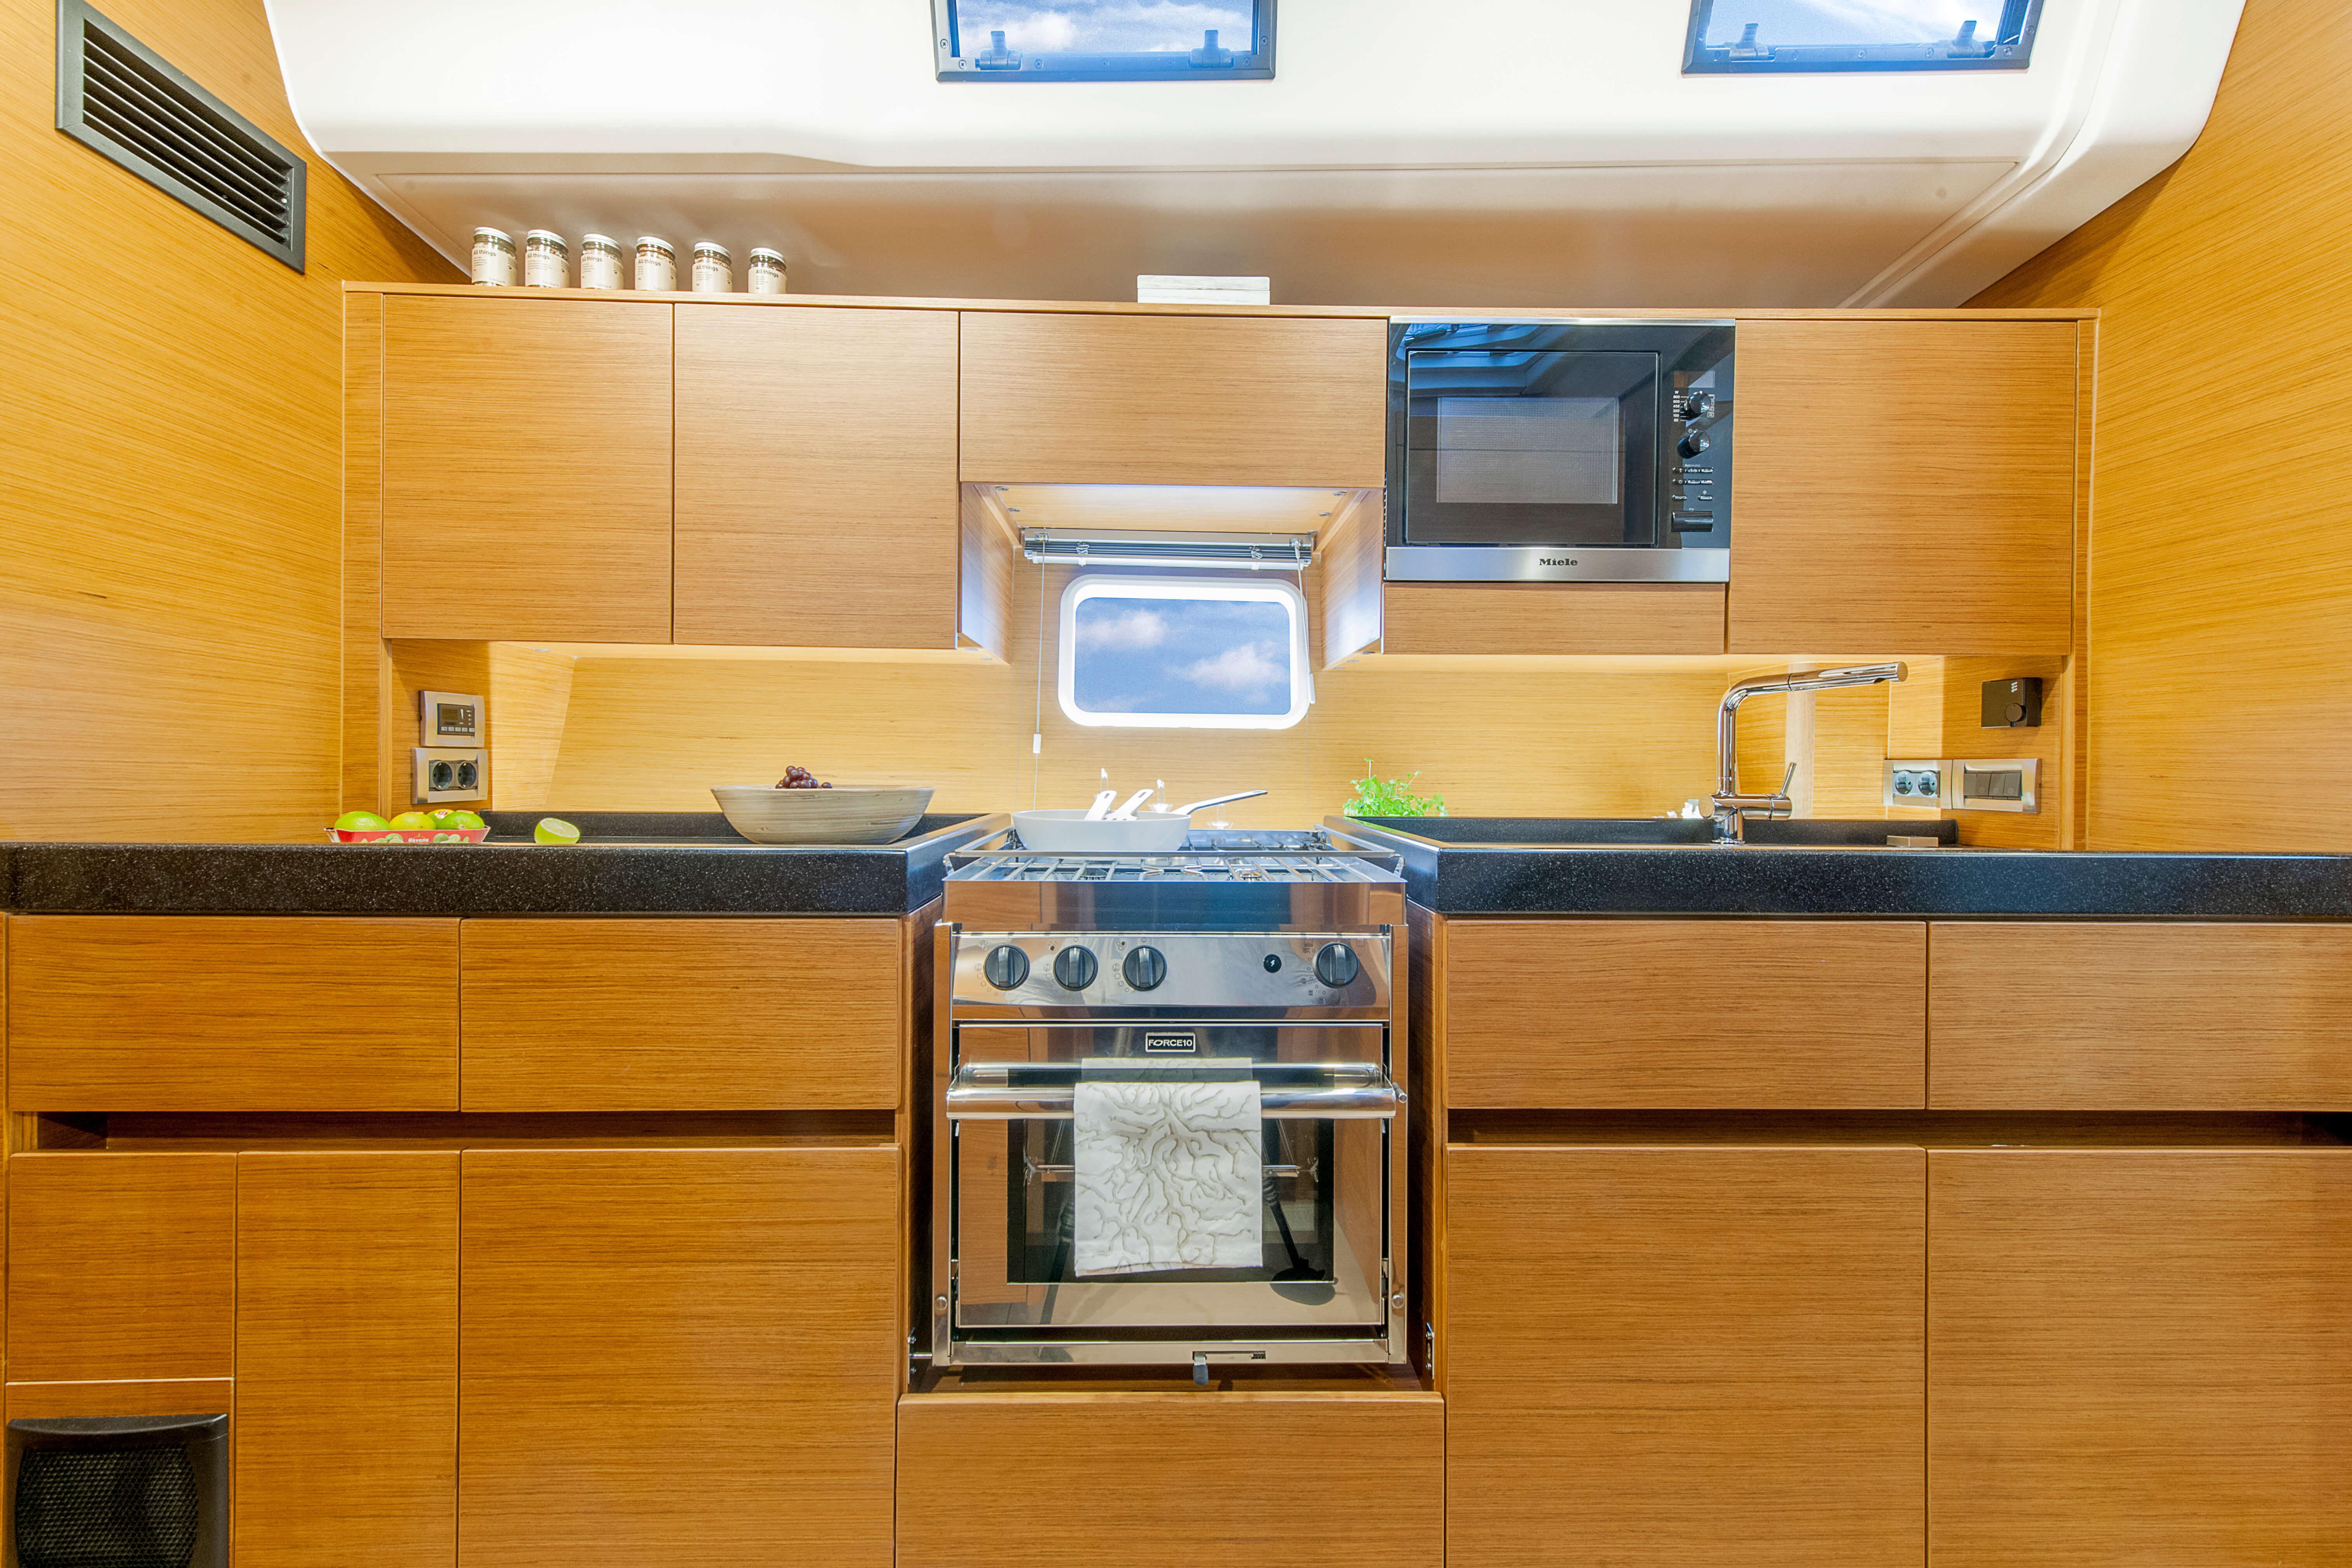 Hanse 675 Interior view pantry | oven, microwave Miele, worktop Corian Antracite | Hanse